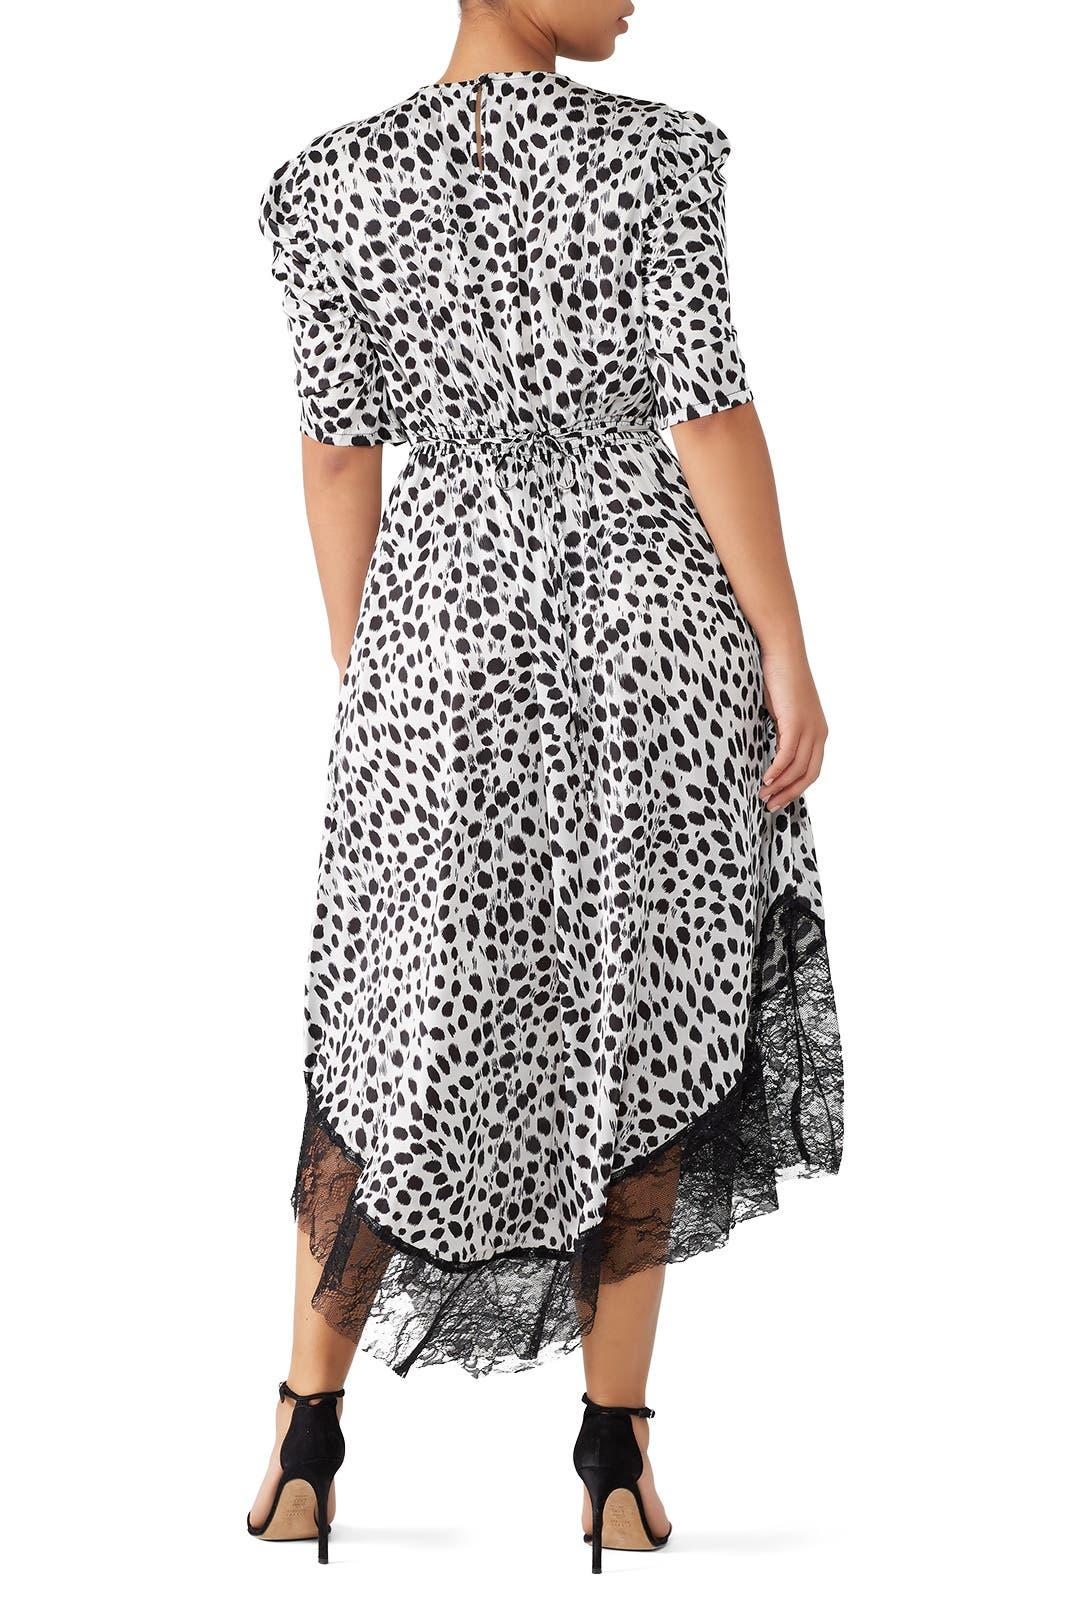 c2ebcd916ab Wispy Floral Print Midi Dress – DACC